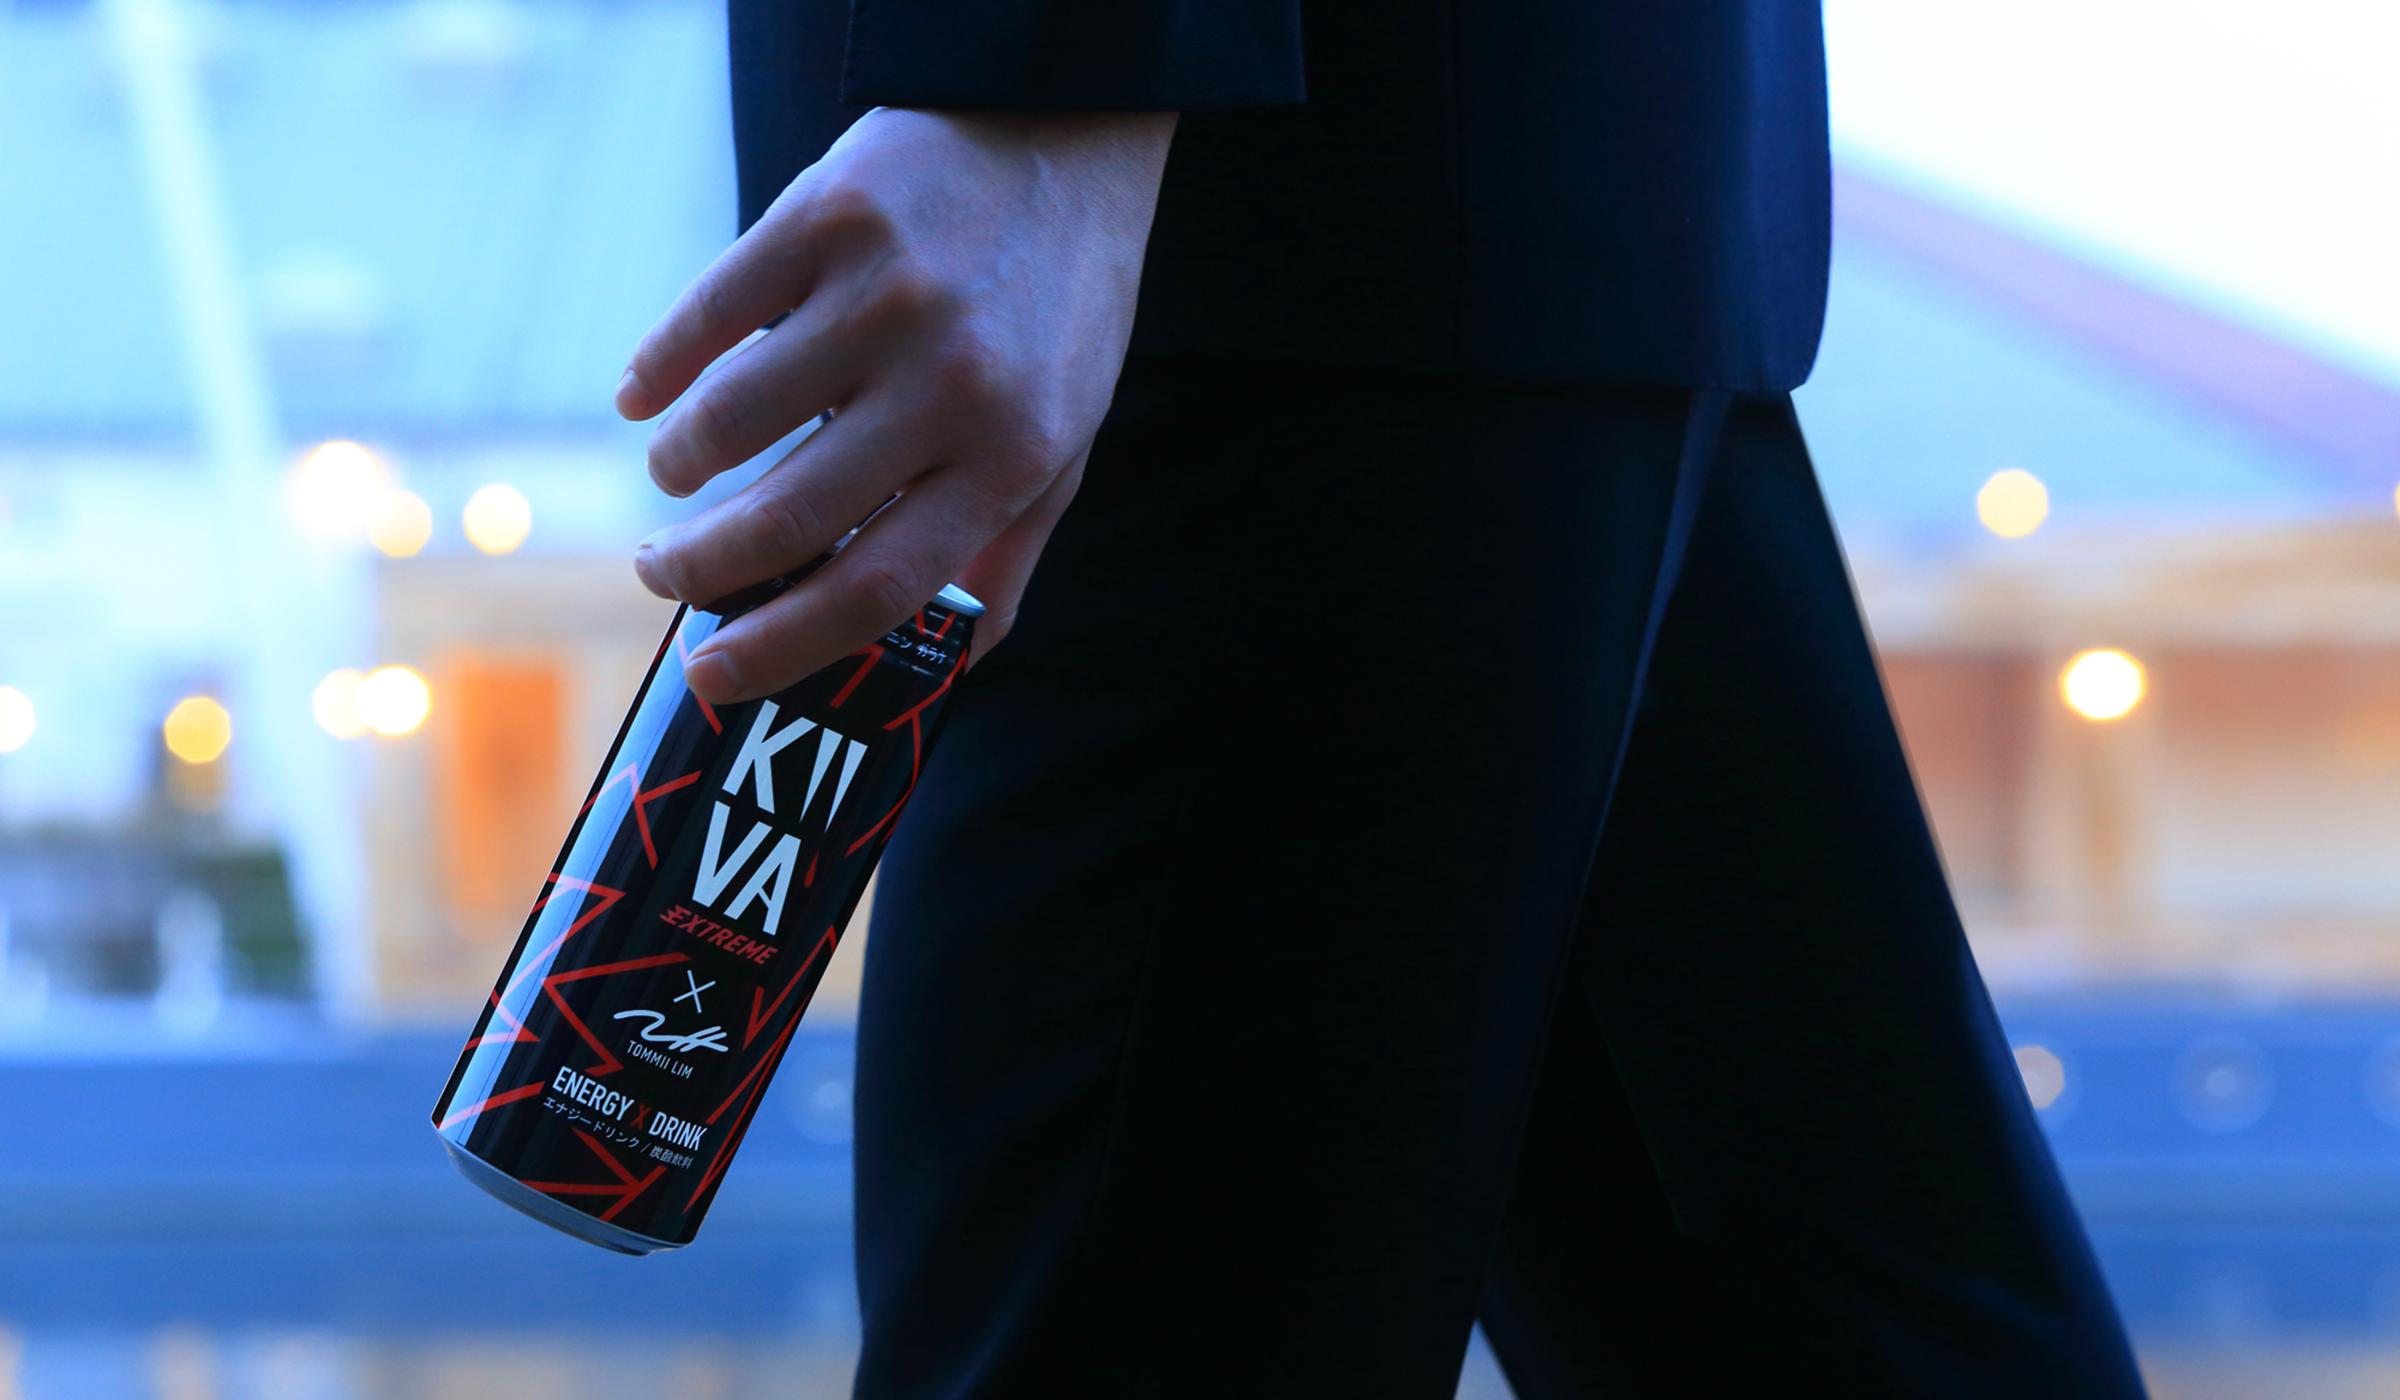 KIIVA ENERGY DRINK キーバエナジードリンク EXTREME